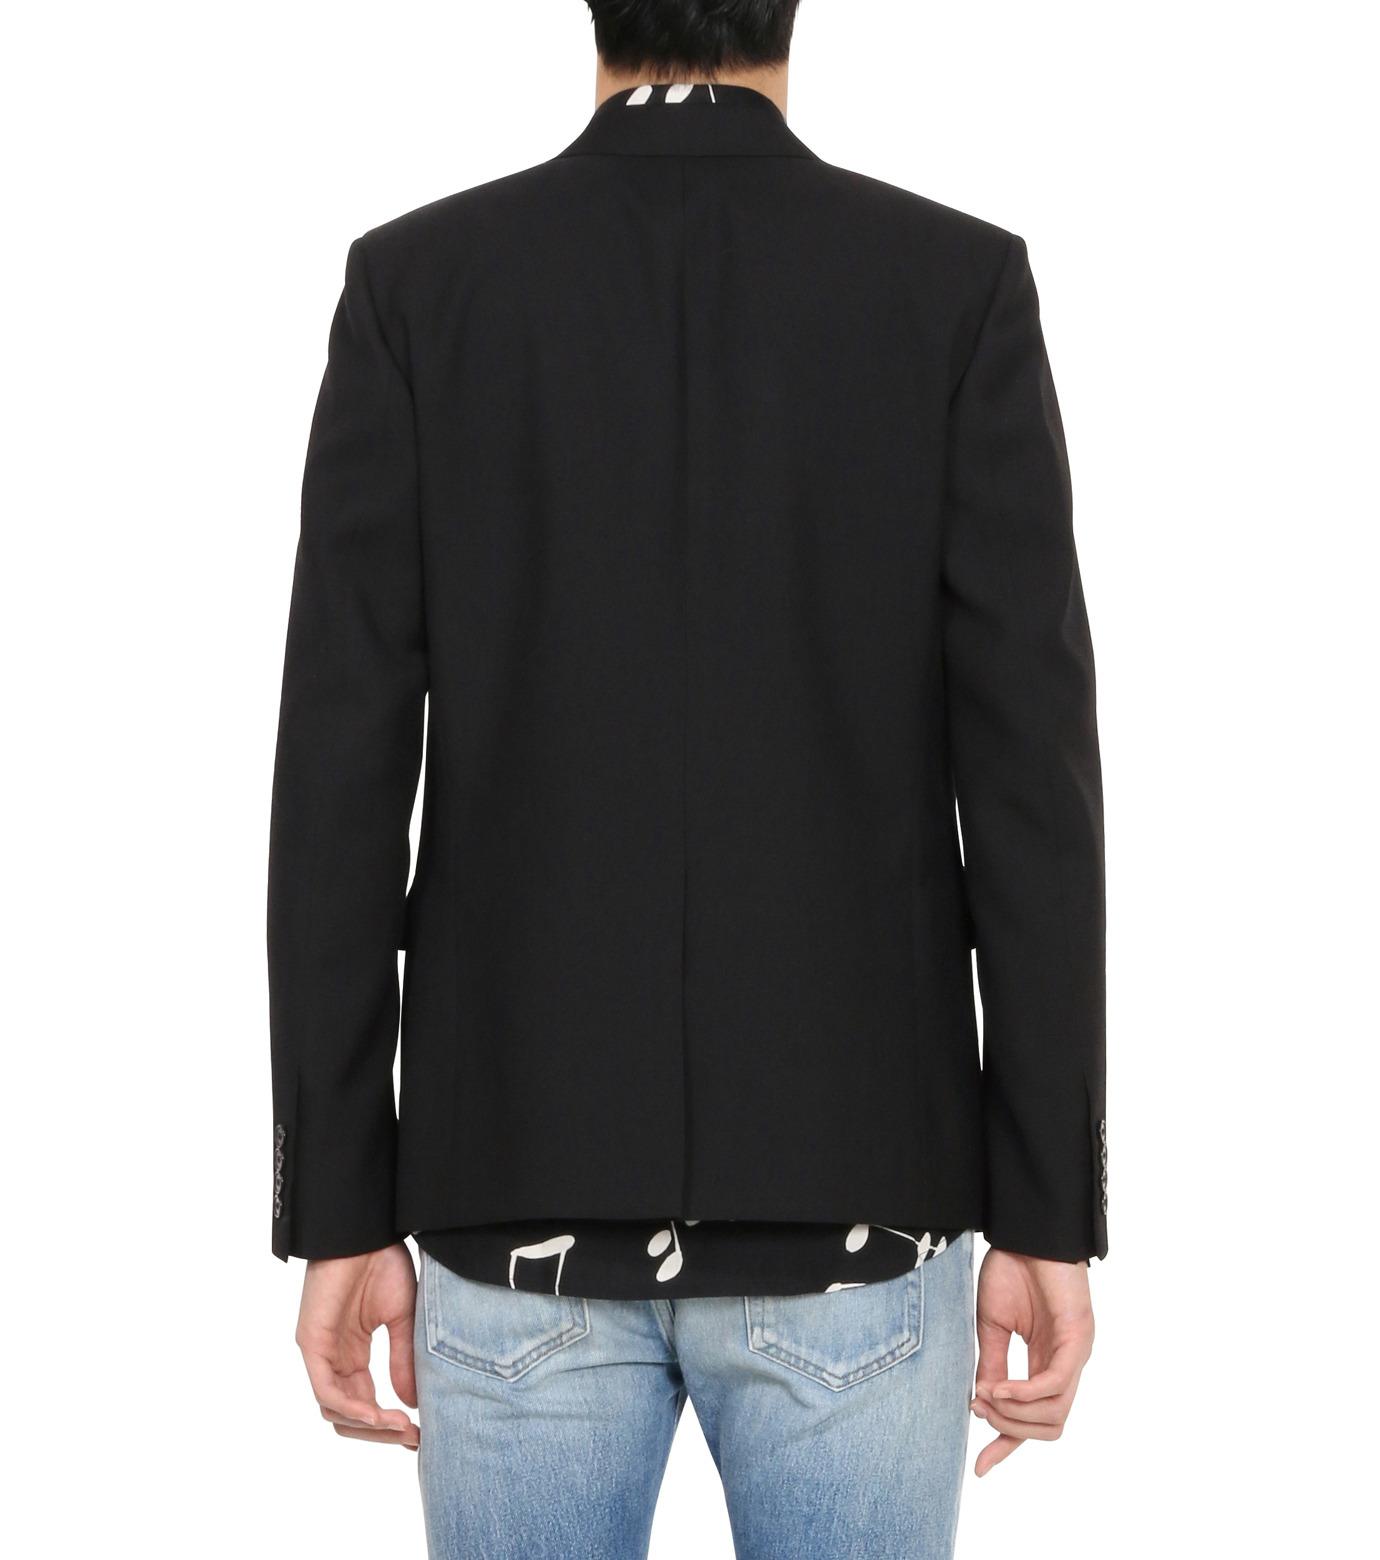 SAINT LAURENT(サンローラン)のStripe Jacket-BLACK(ジャケット/jacket)-394019-Y239W-13 拡大詳細画像2